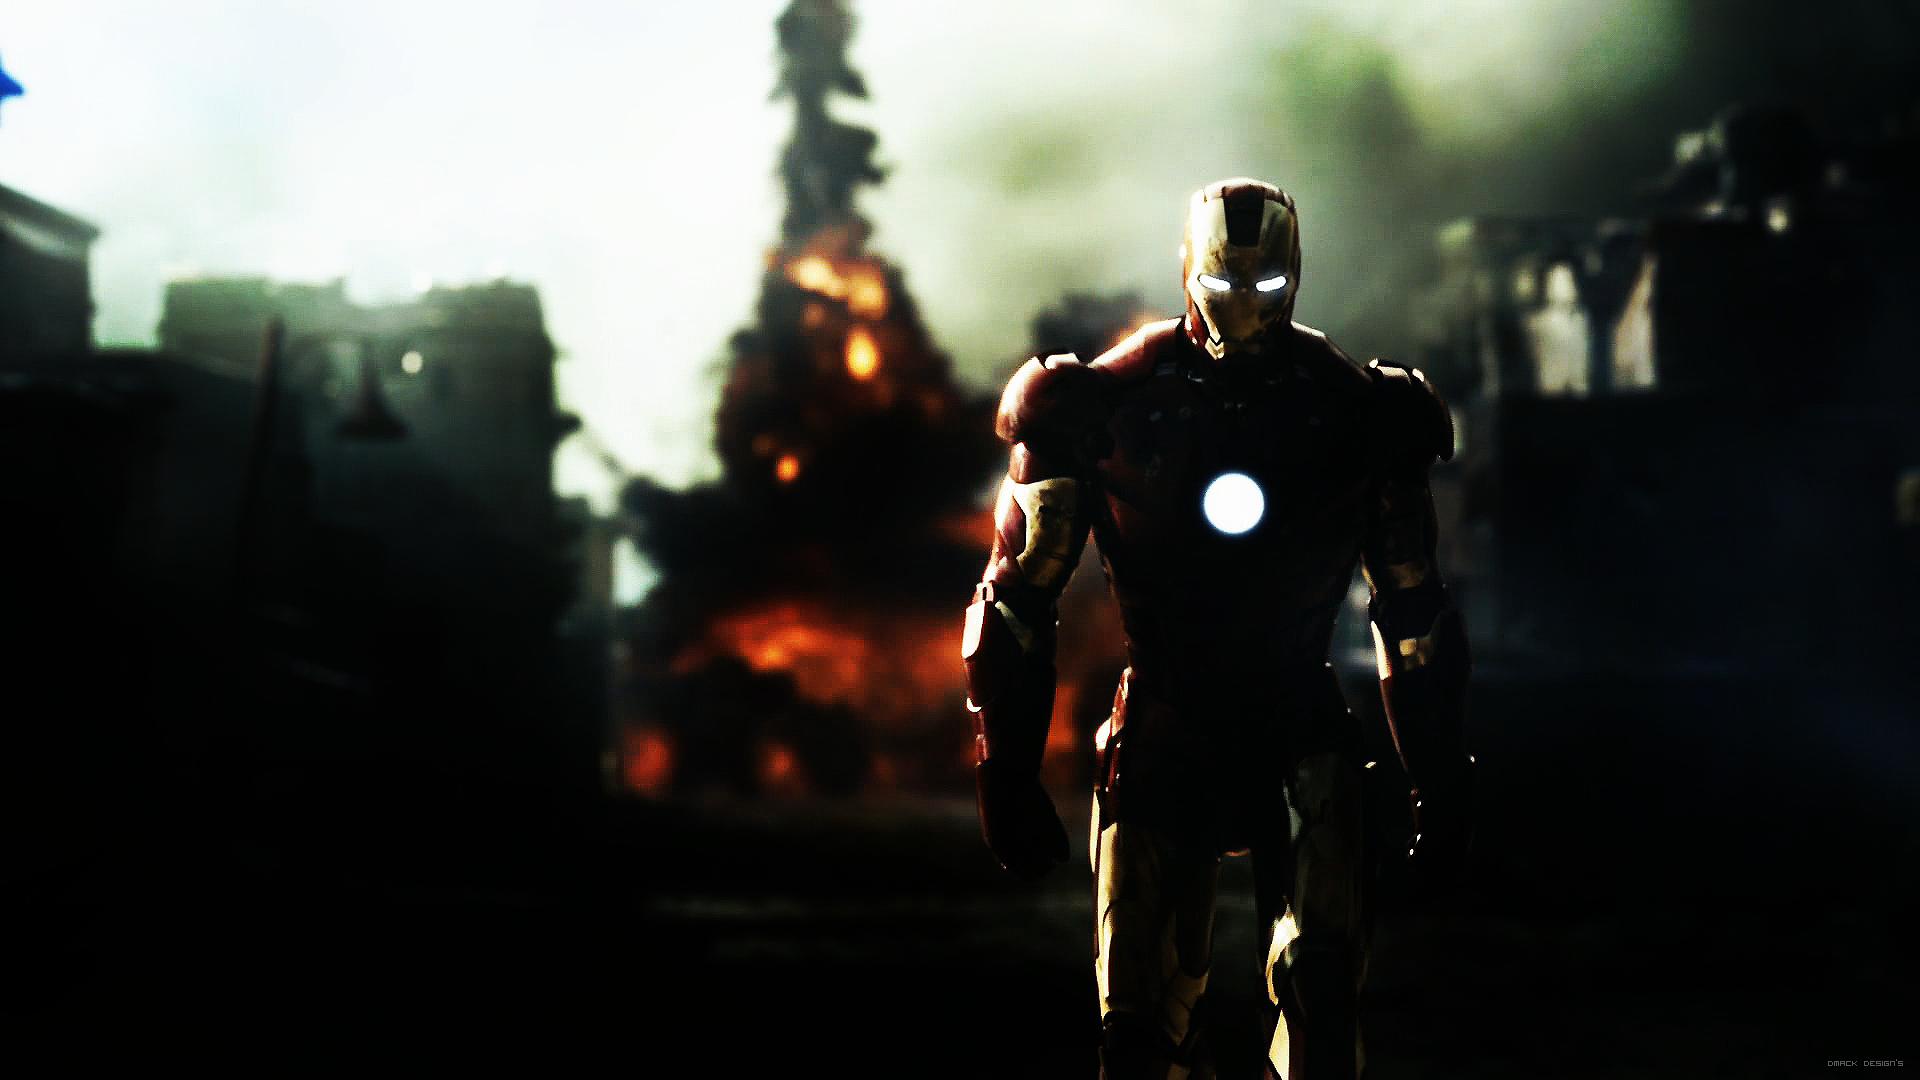 48 Iron Man Hd Wallpapers 1080p On Wallpapersafari